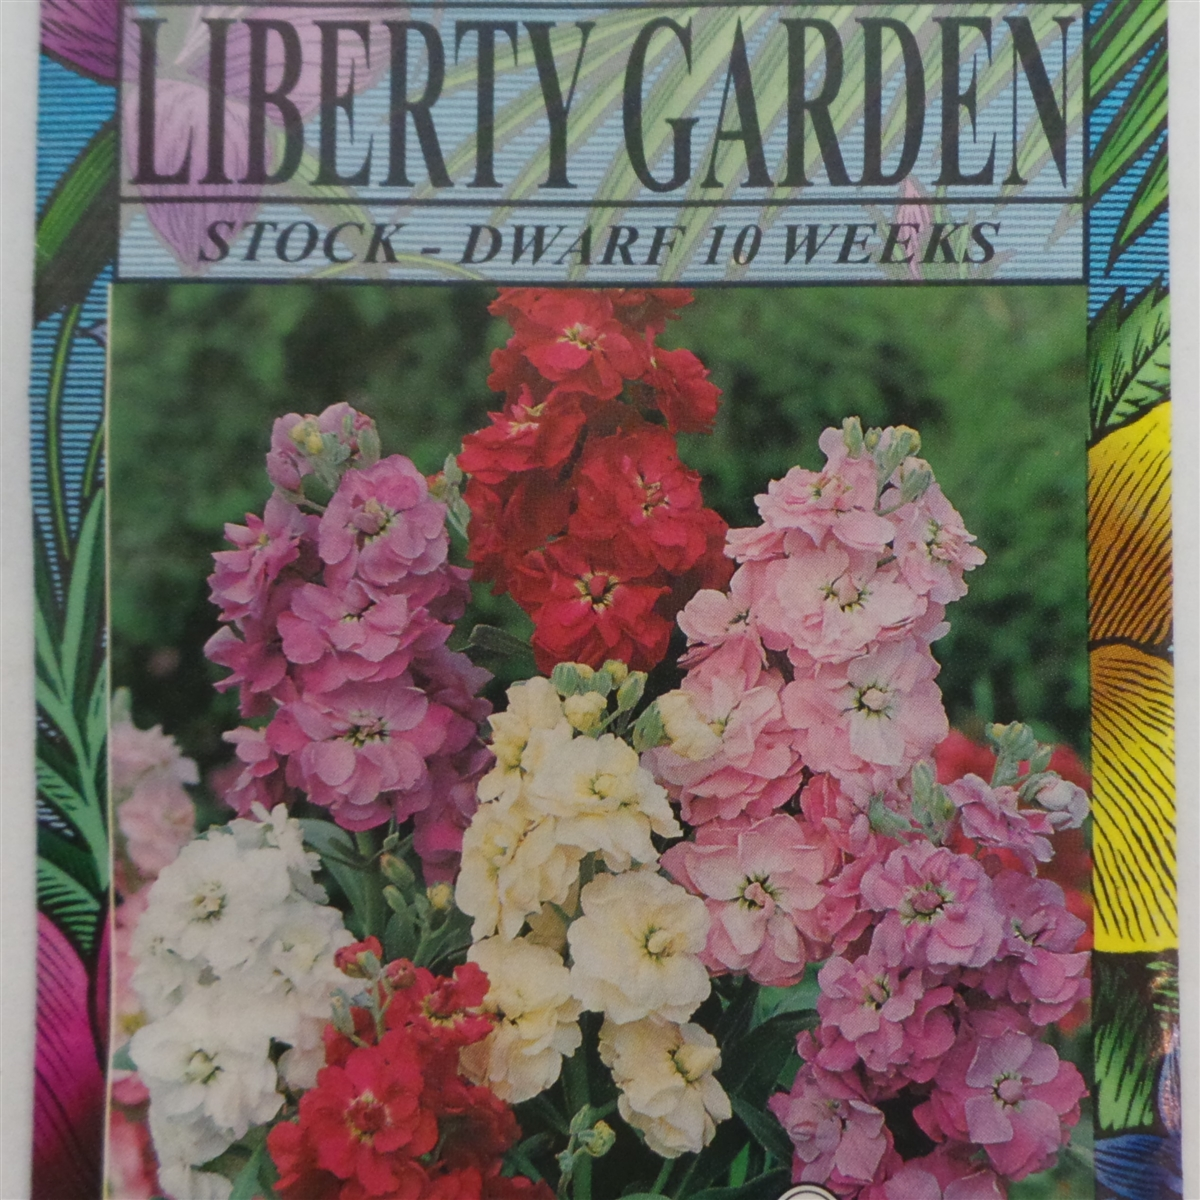 Stock Dwarf 10 Week Annual Flower Seeds 1 Packet